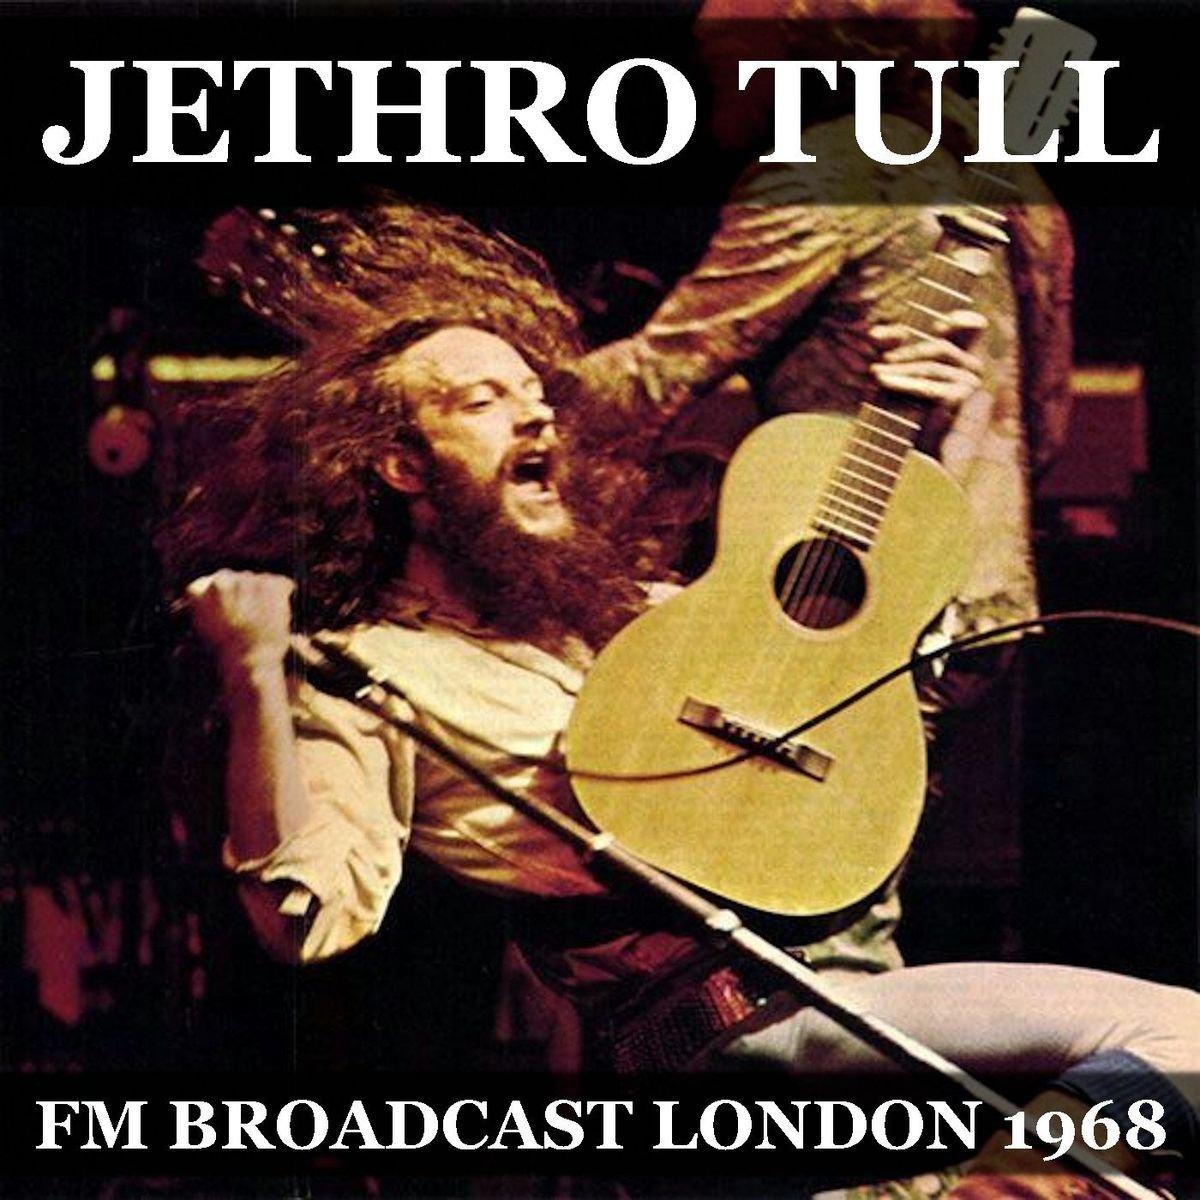 Jethro Tull - FM Broadcast London 1968 (2020) CD